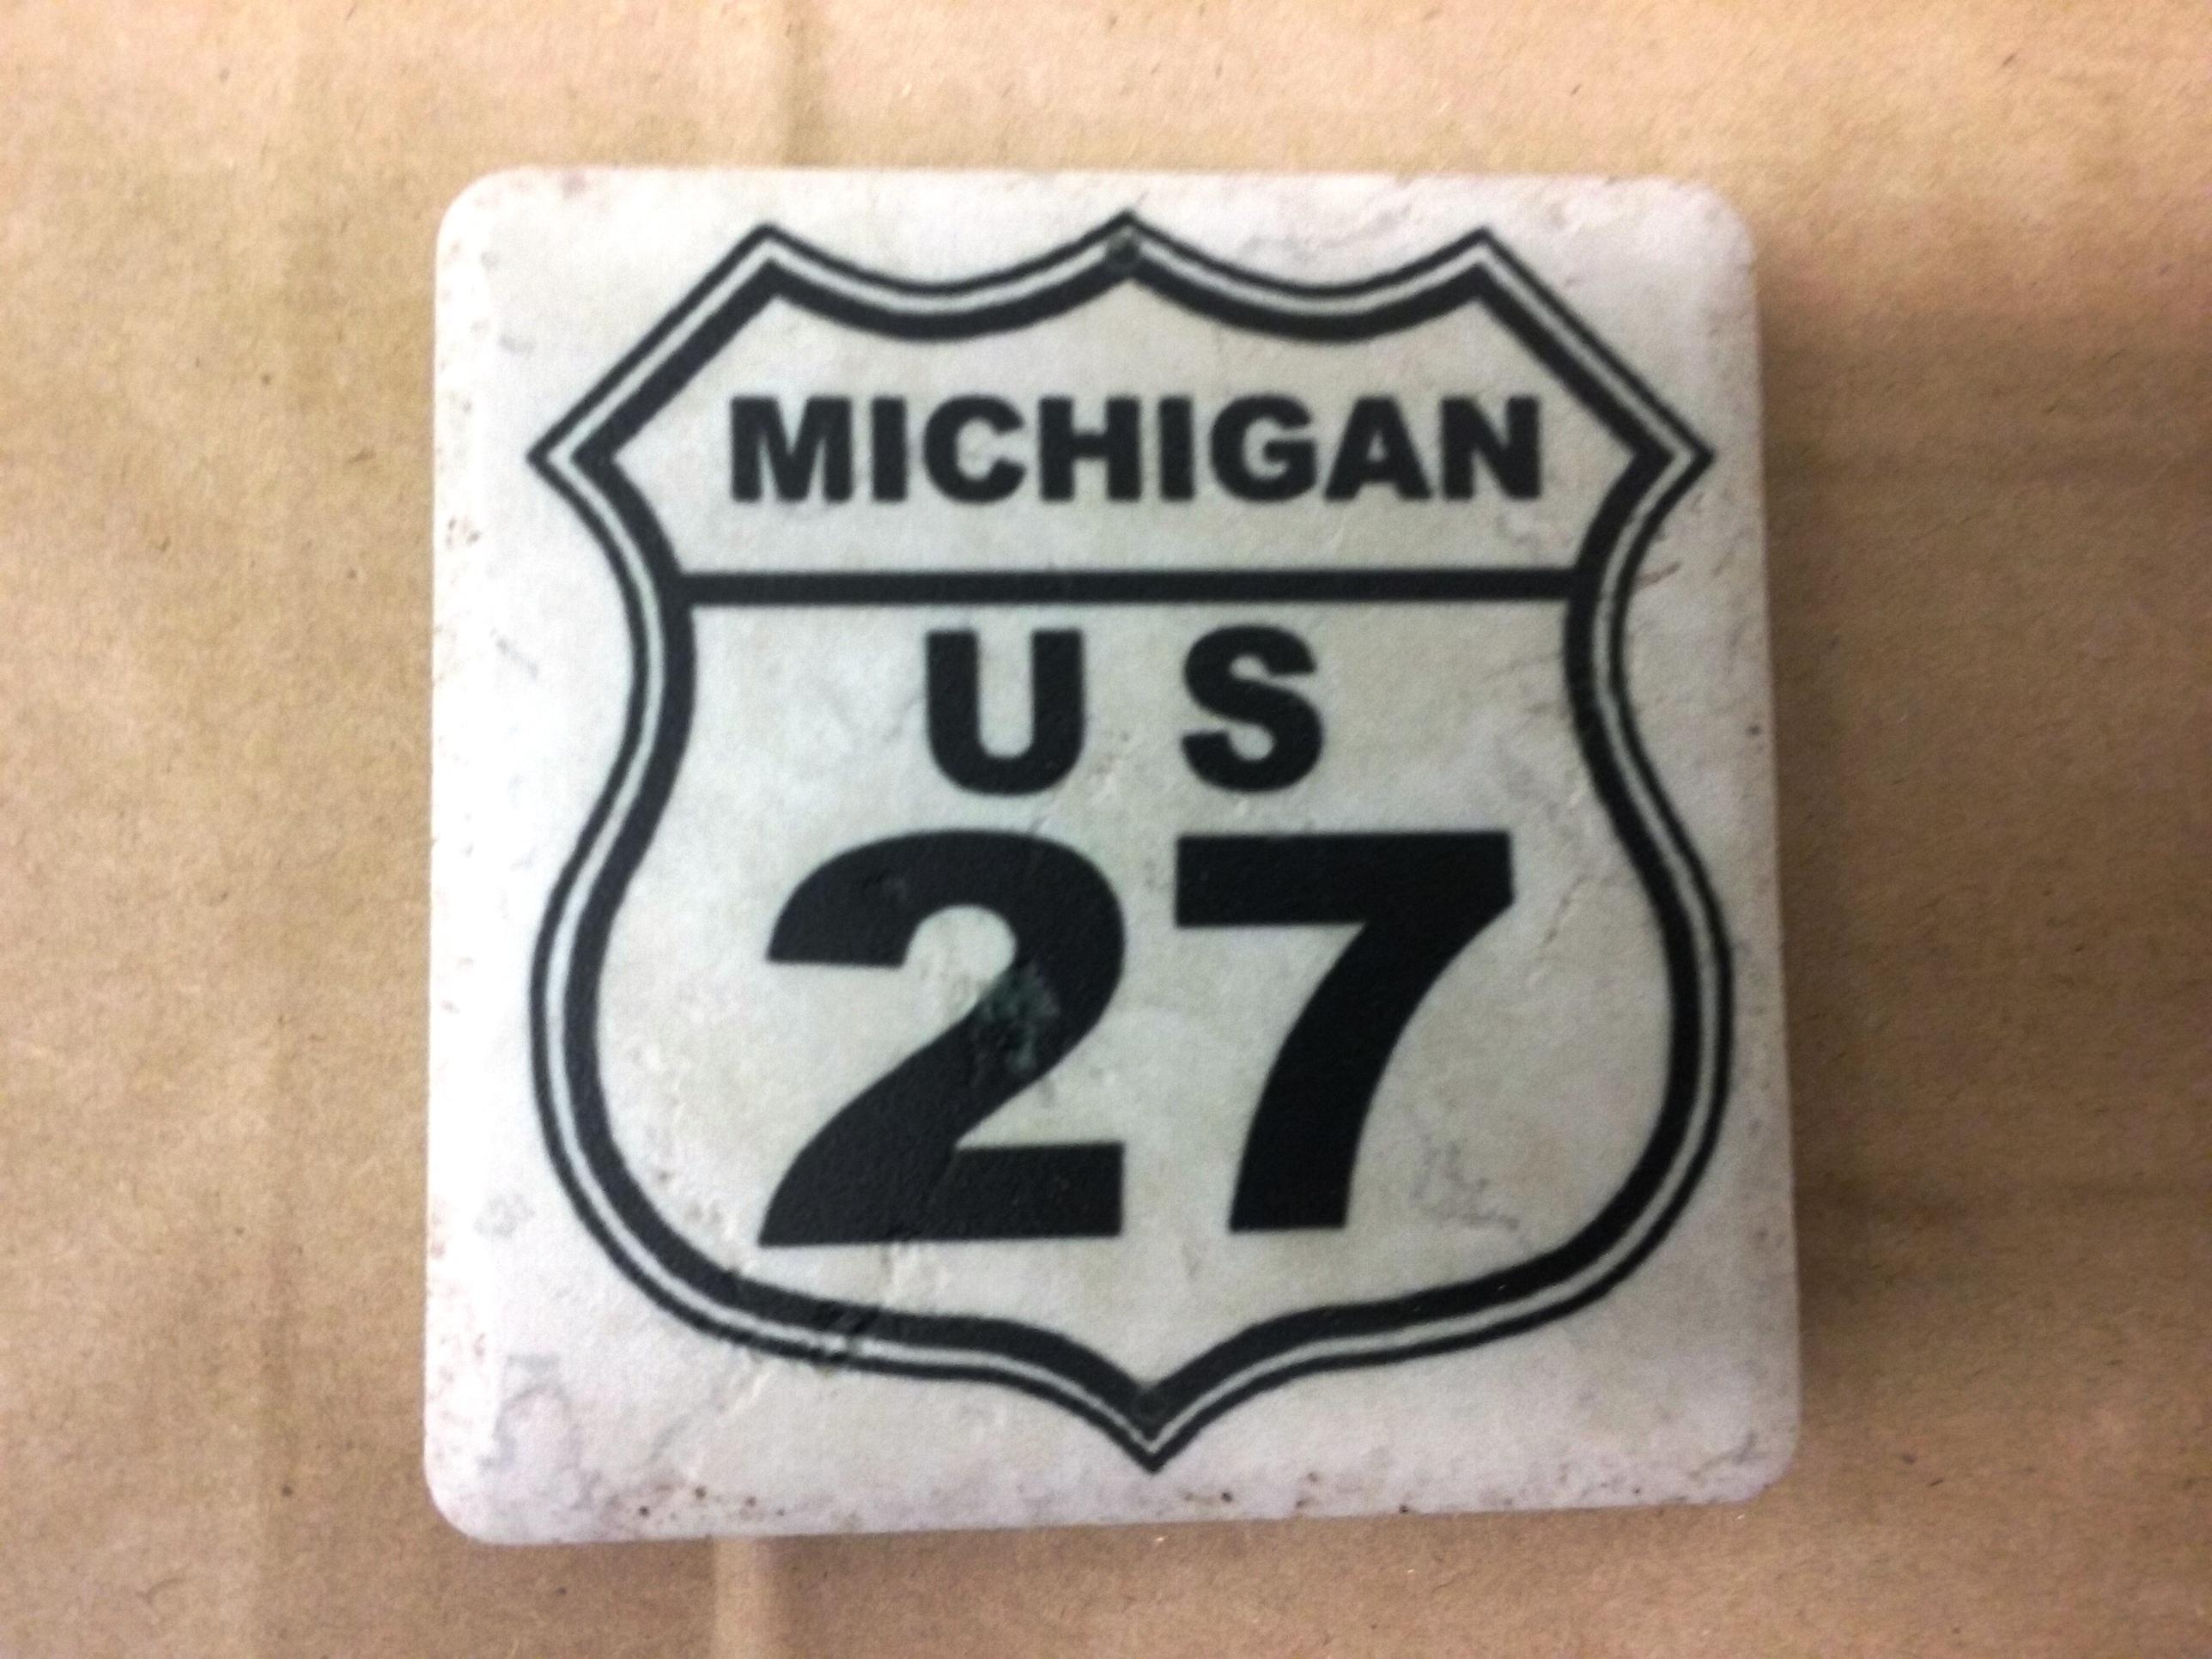 US-27